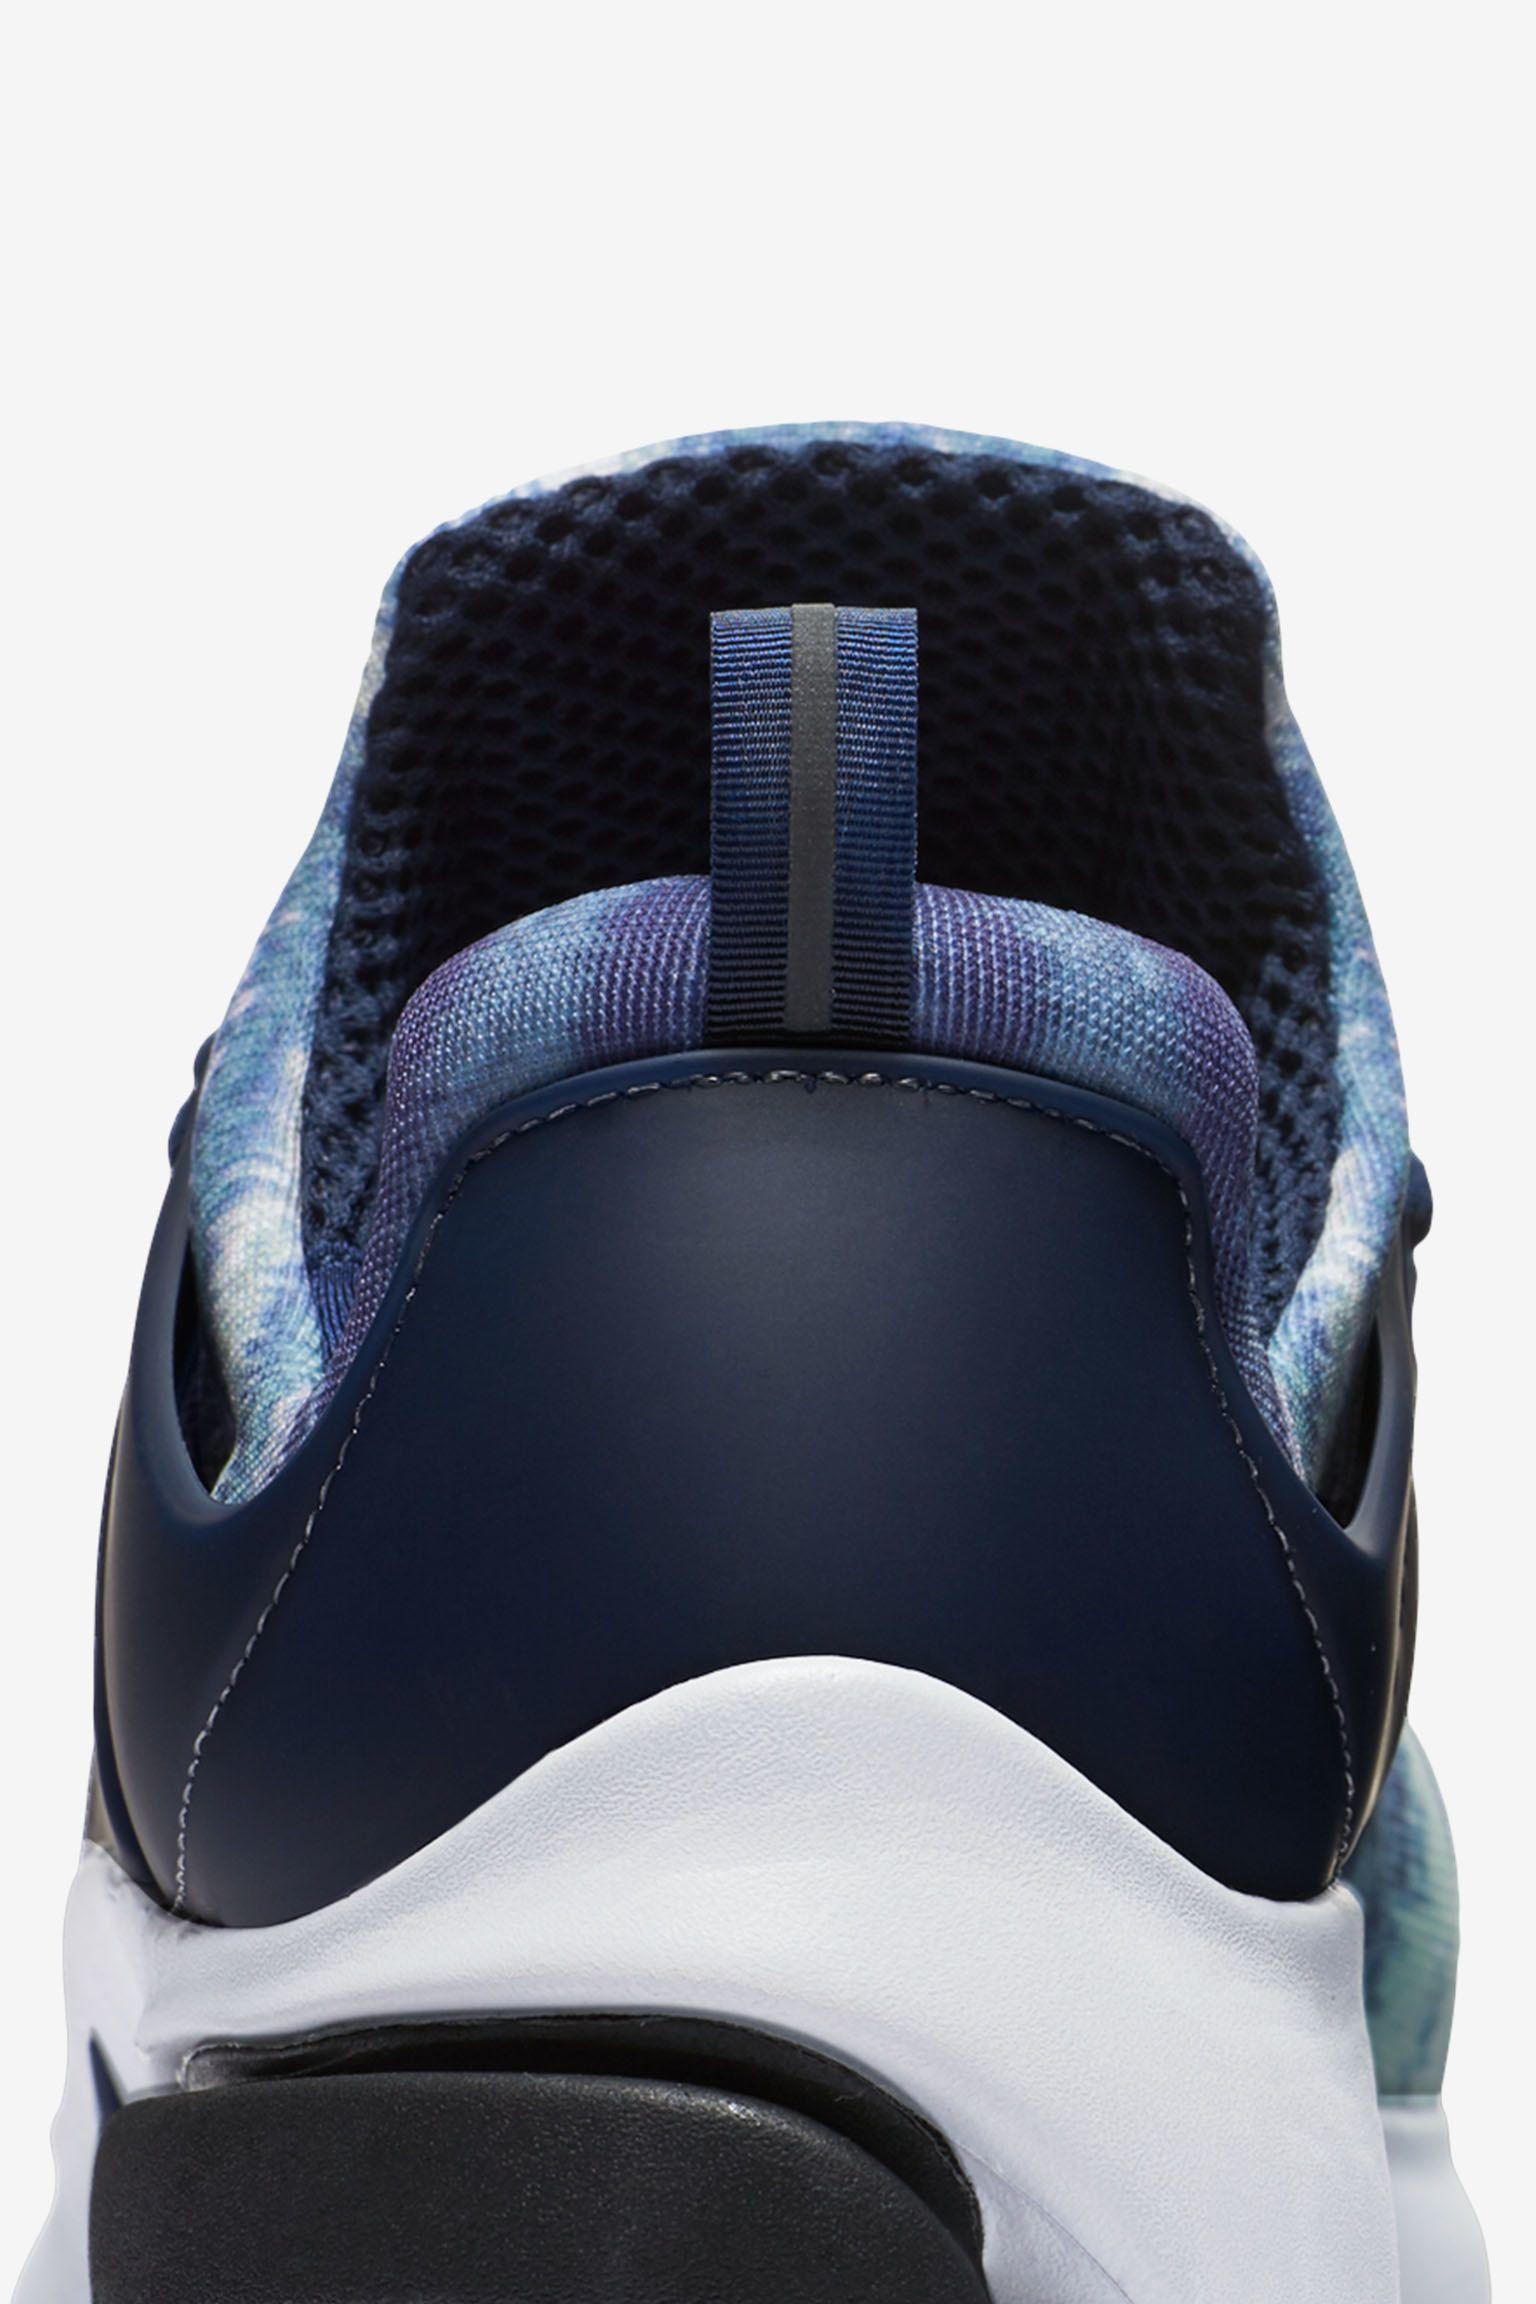 Nike Air Presto 'Ocean Fog' Release Date